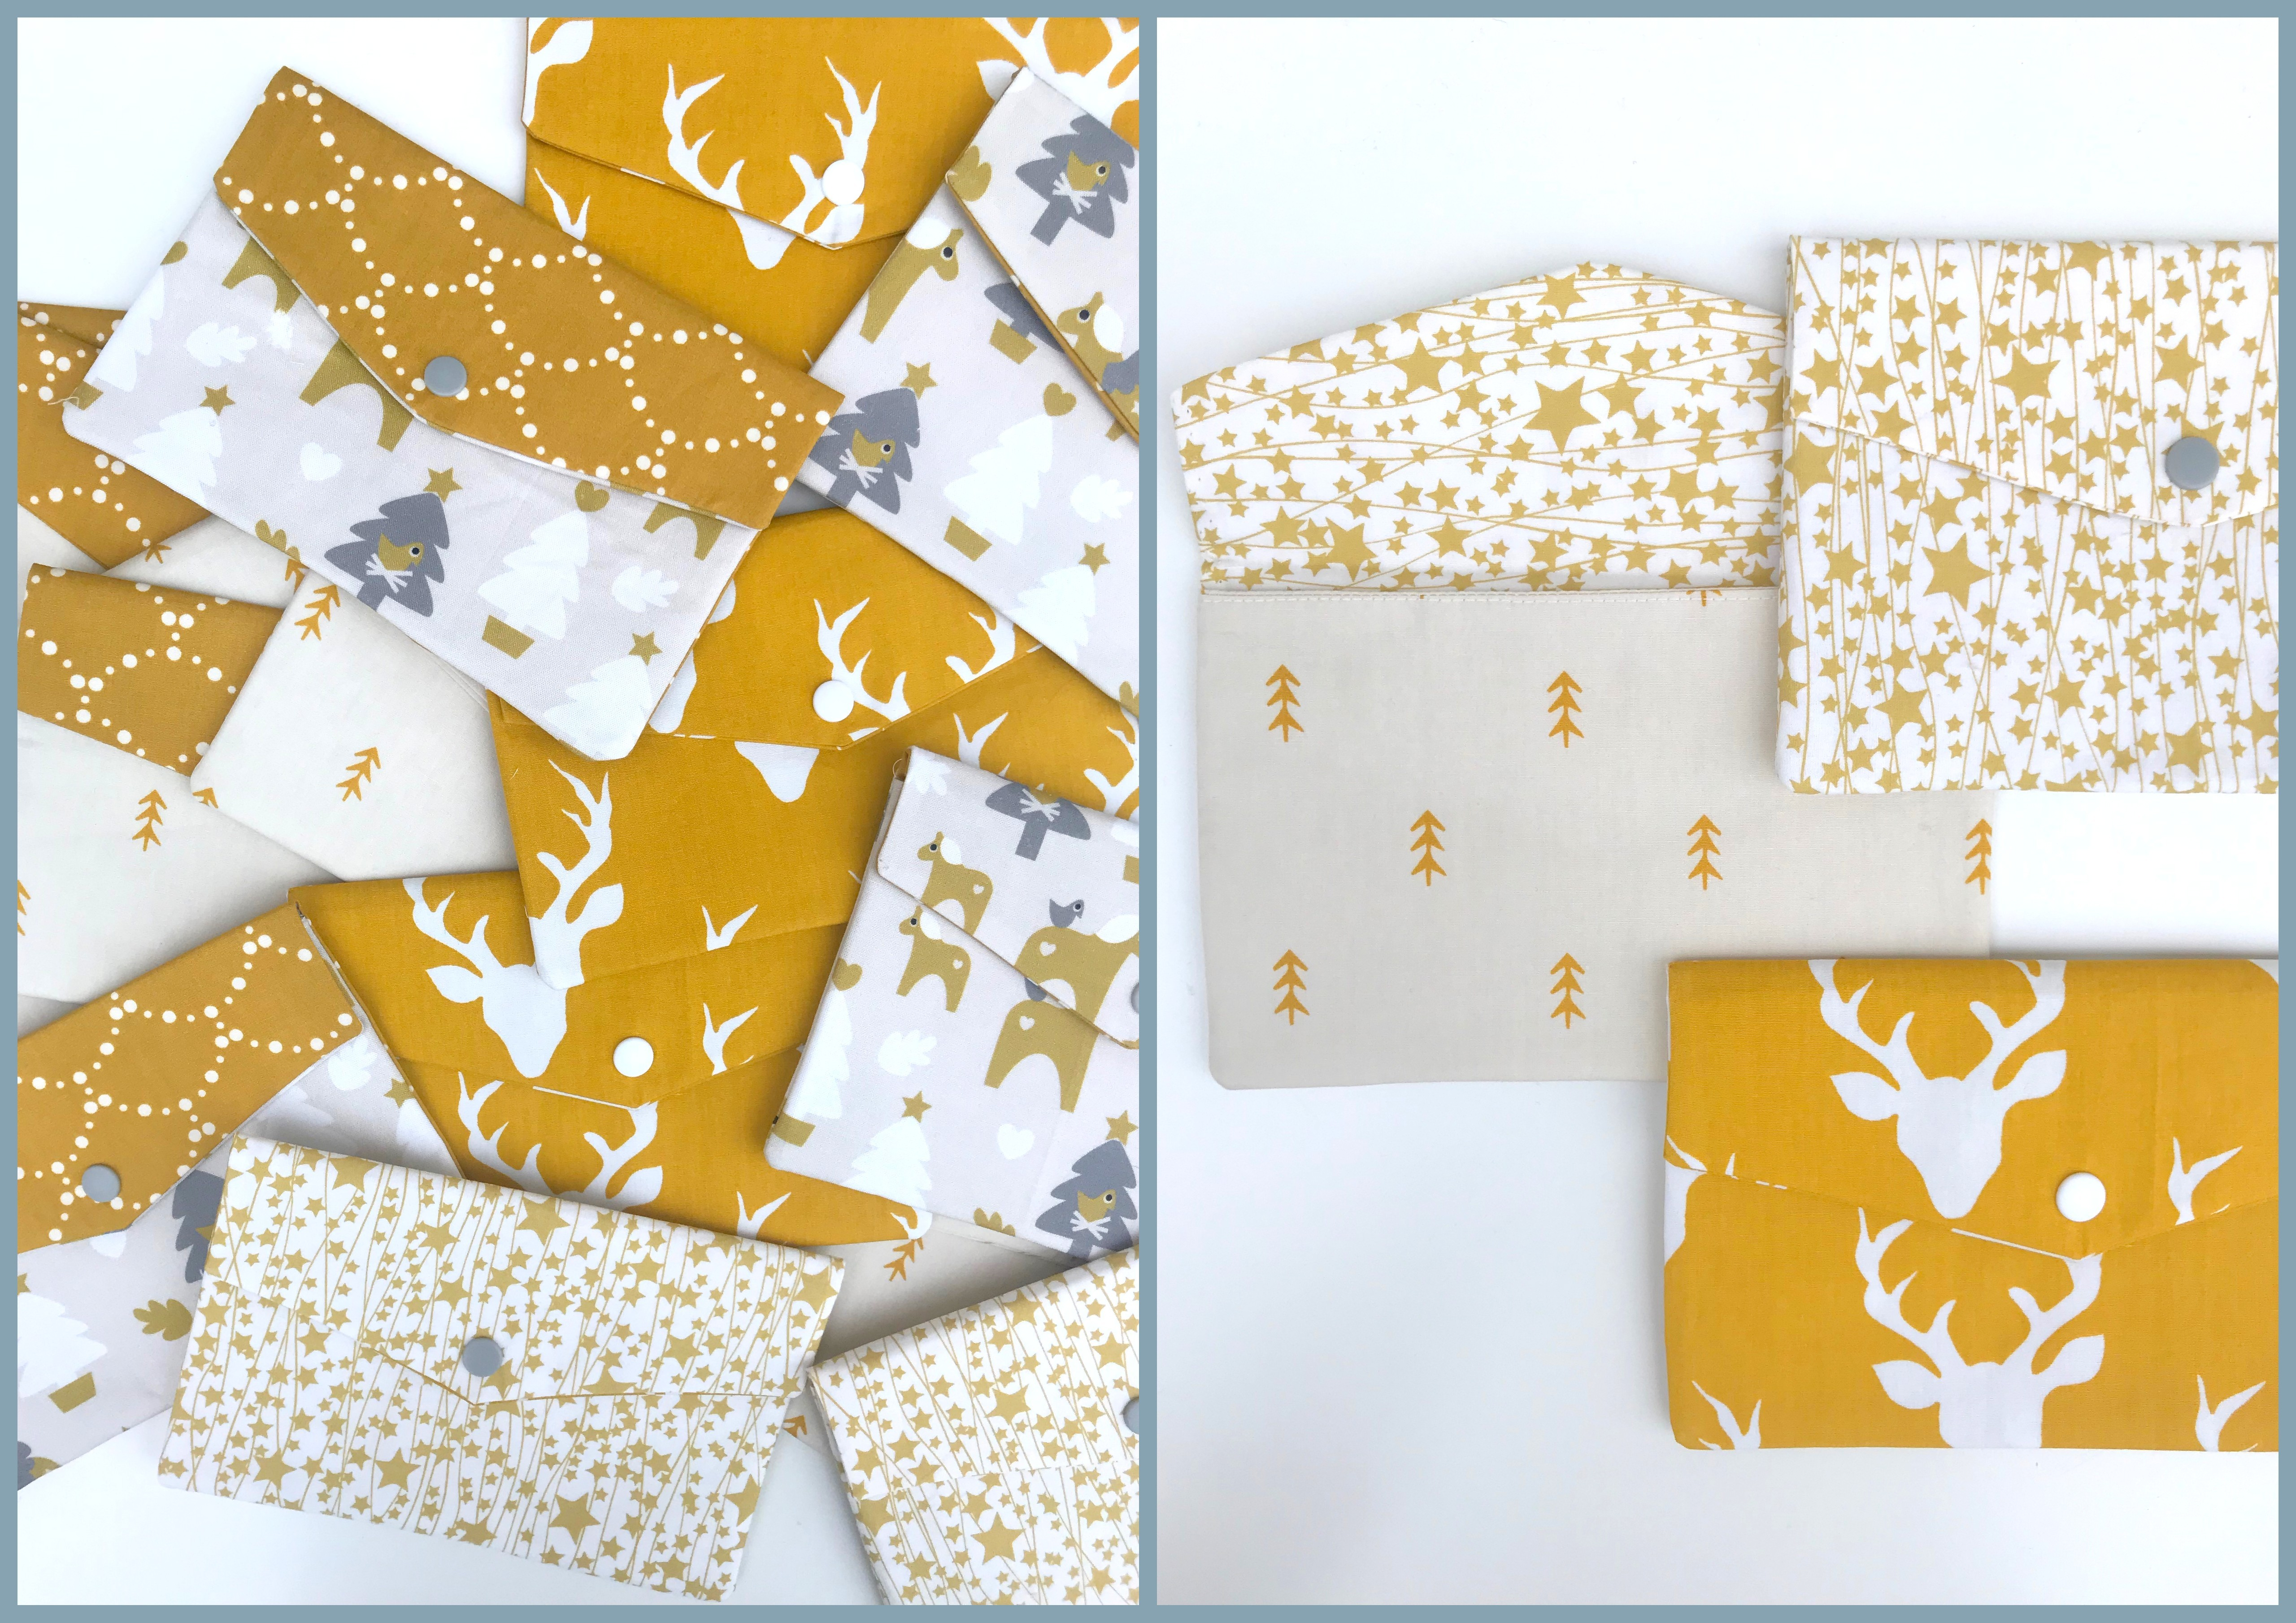 Tilly voor Kerst (collage 1)